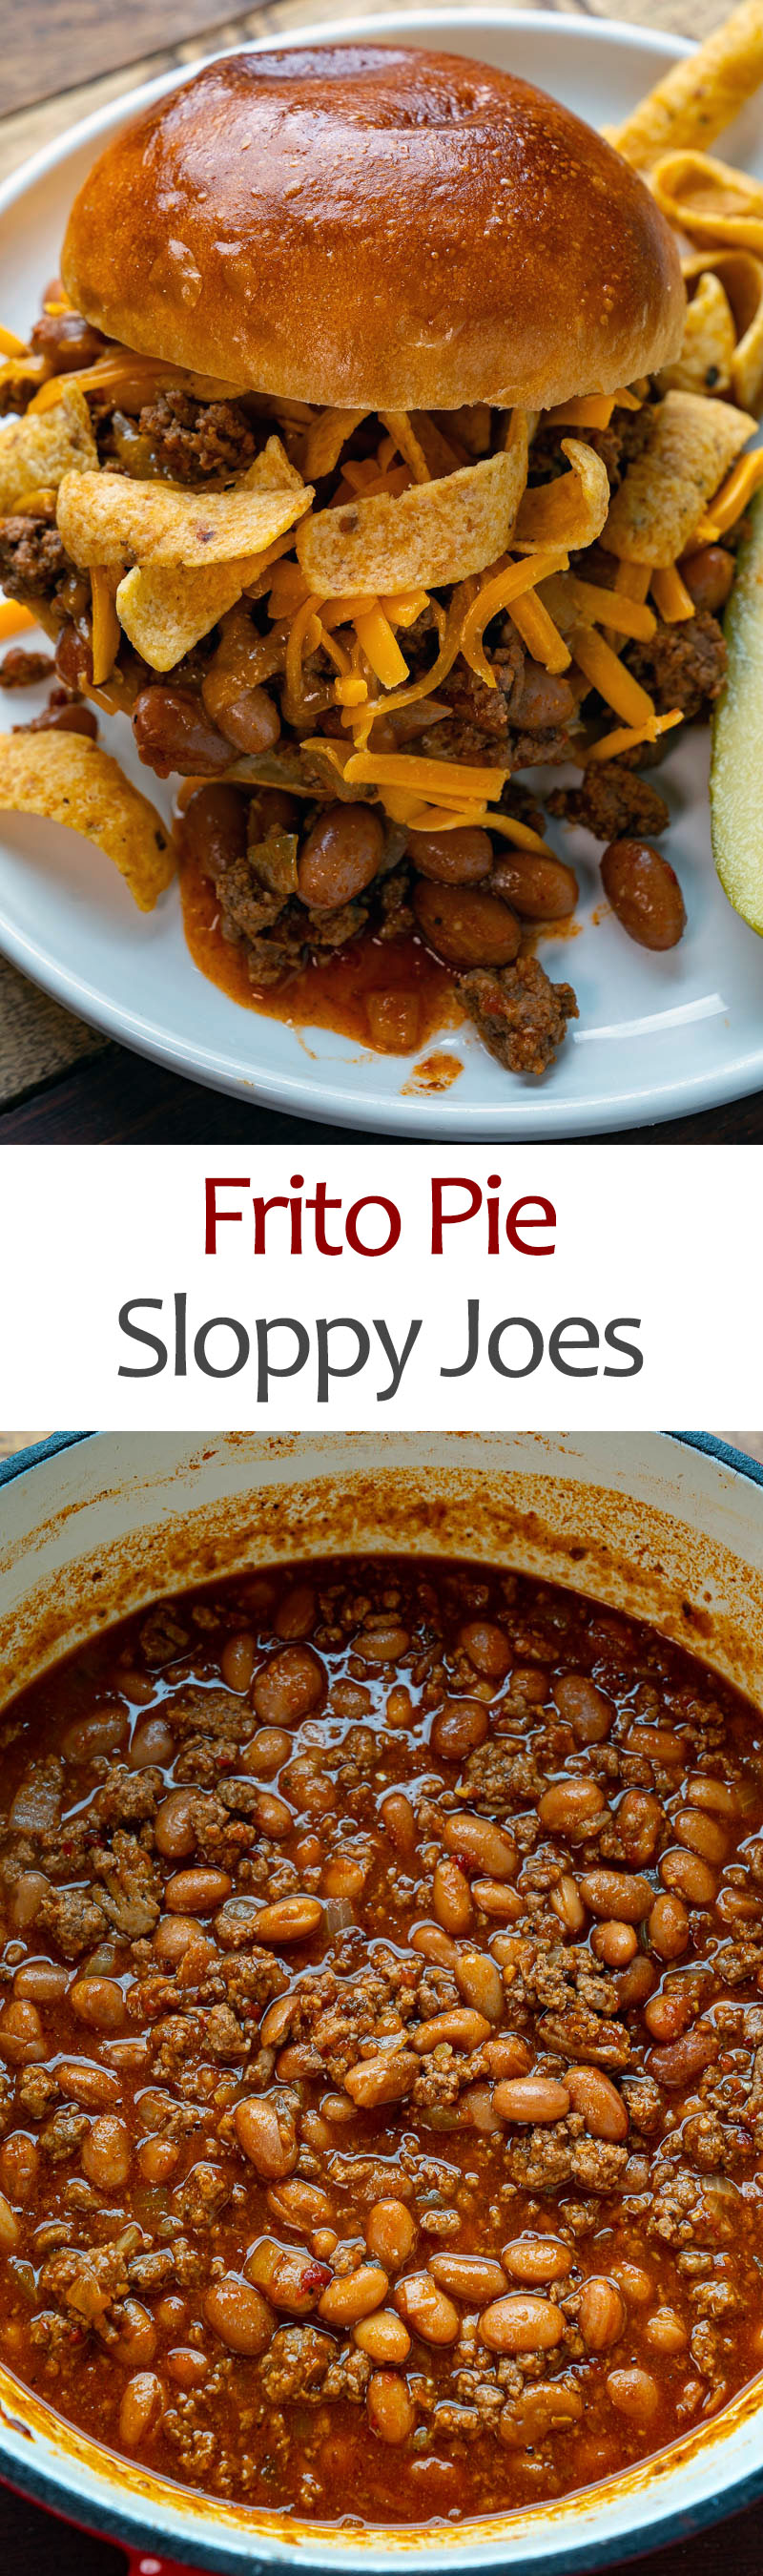 Frito Pie Sloppy Joes